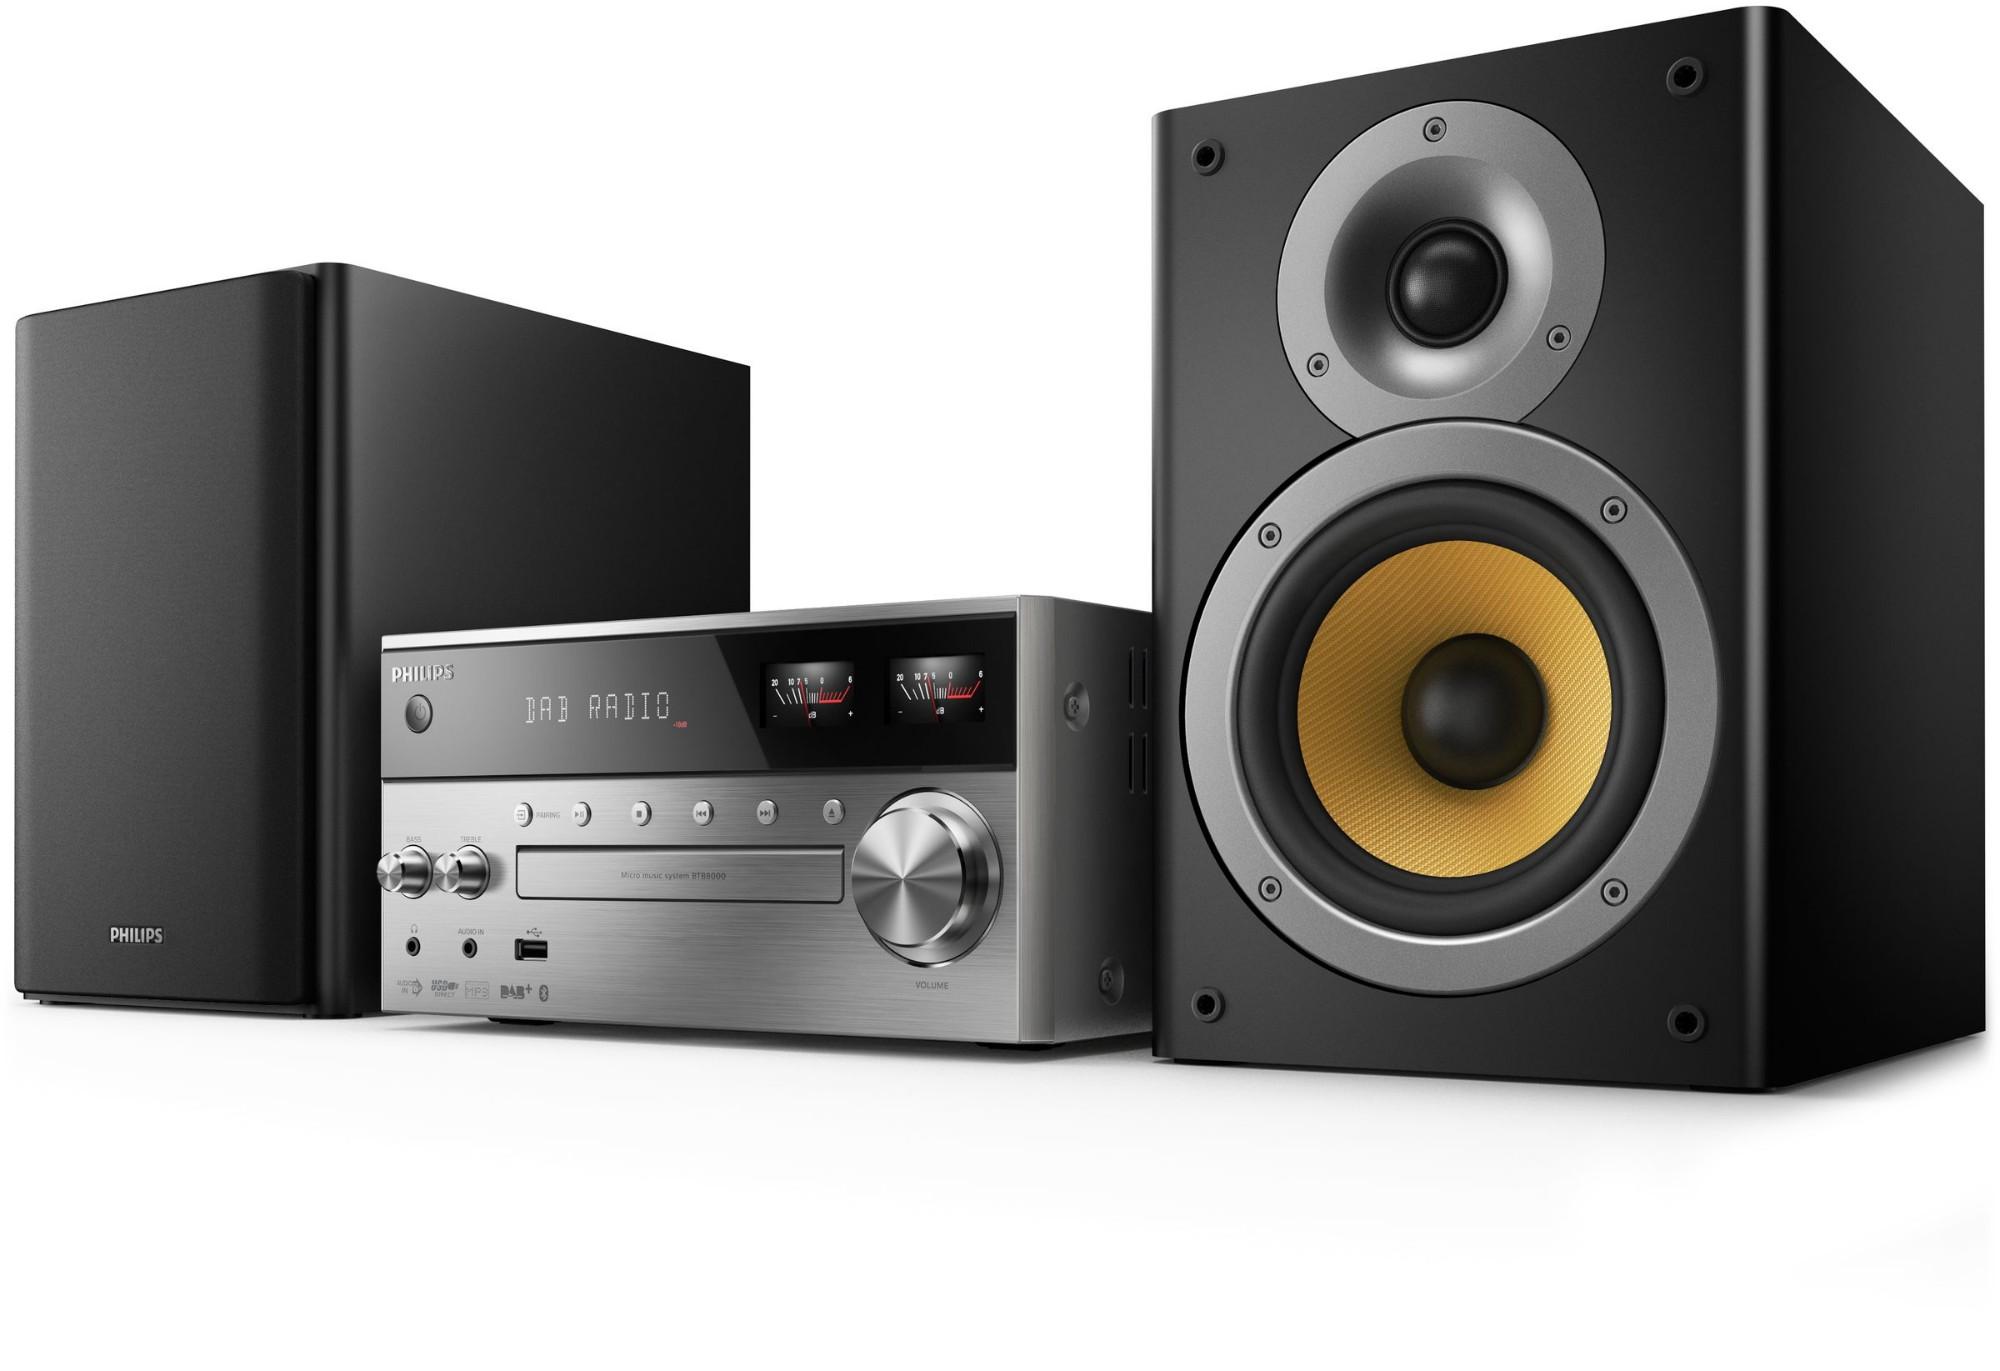 Philips BTB8000/12 home audio set Home audio micro system Black,Silver 150 W